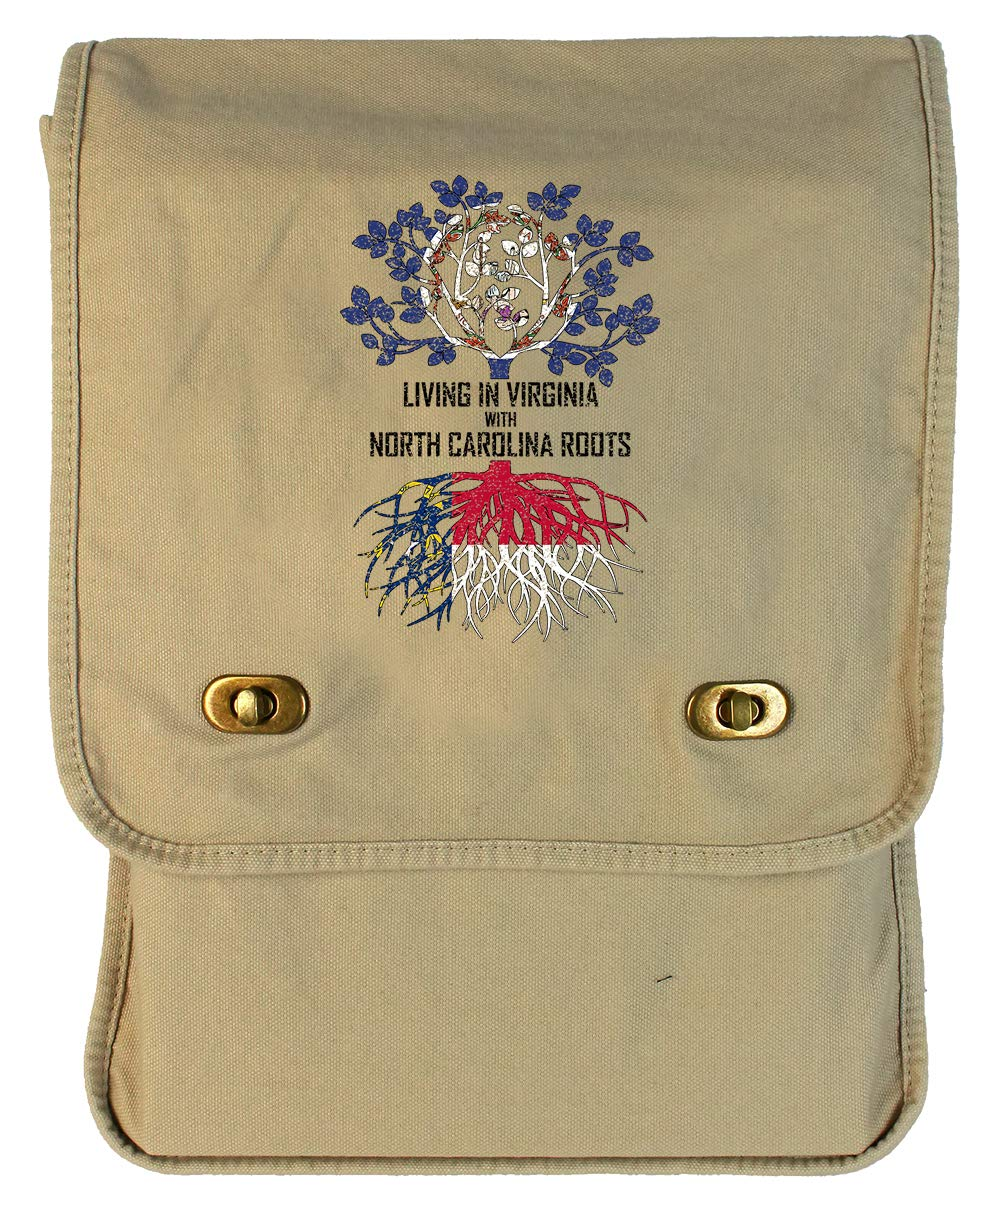 Tenacitee Living In Virginia with North Carolina Roots Grey Brushed Canvas Messenger Bag